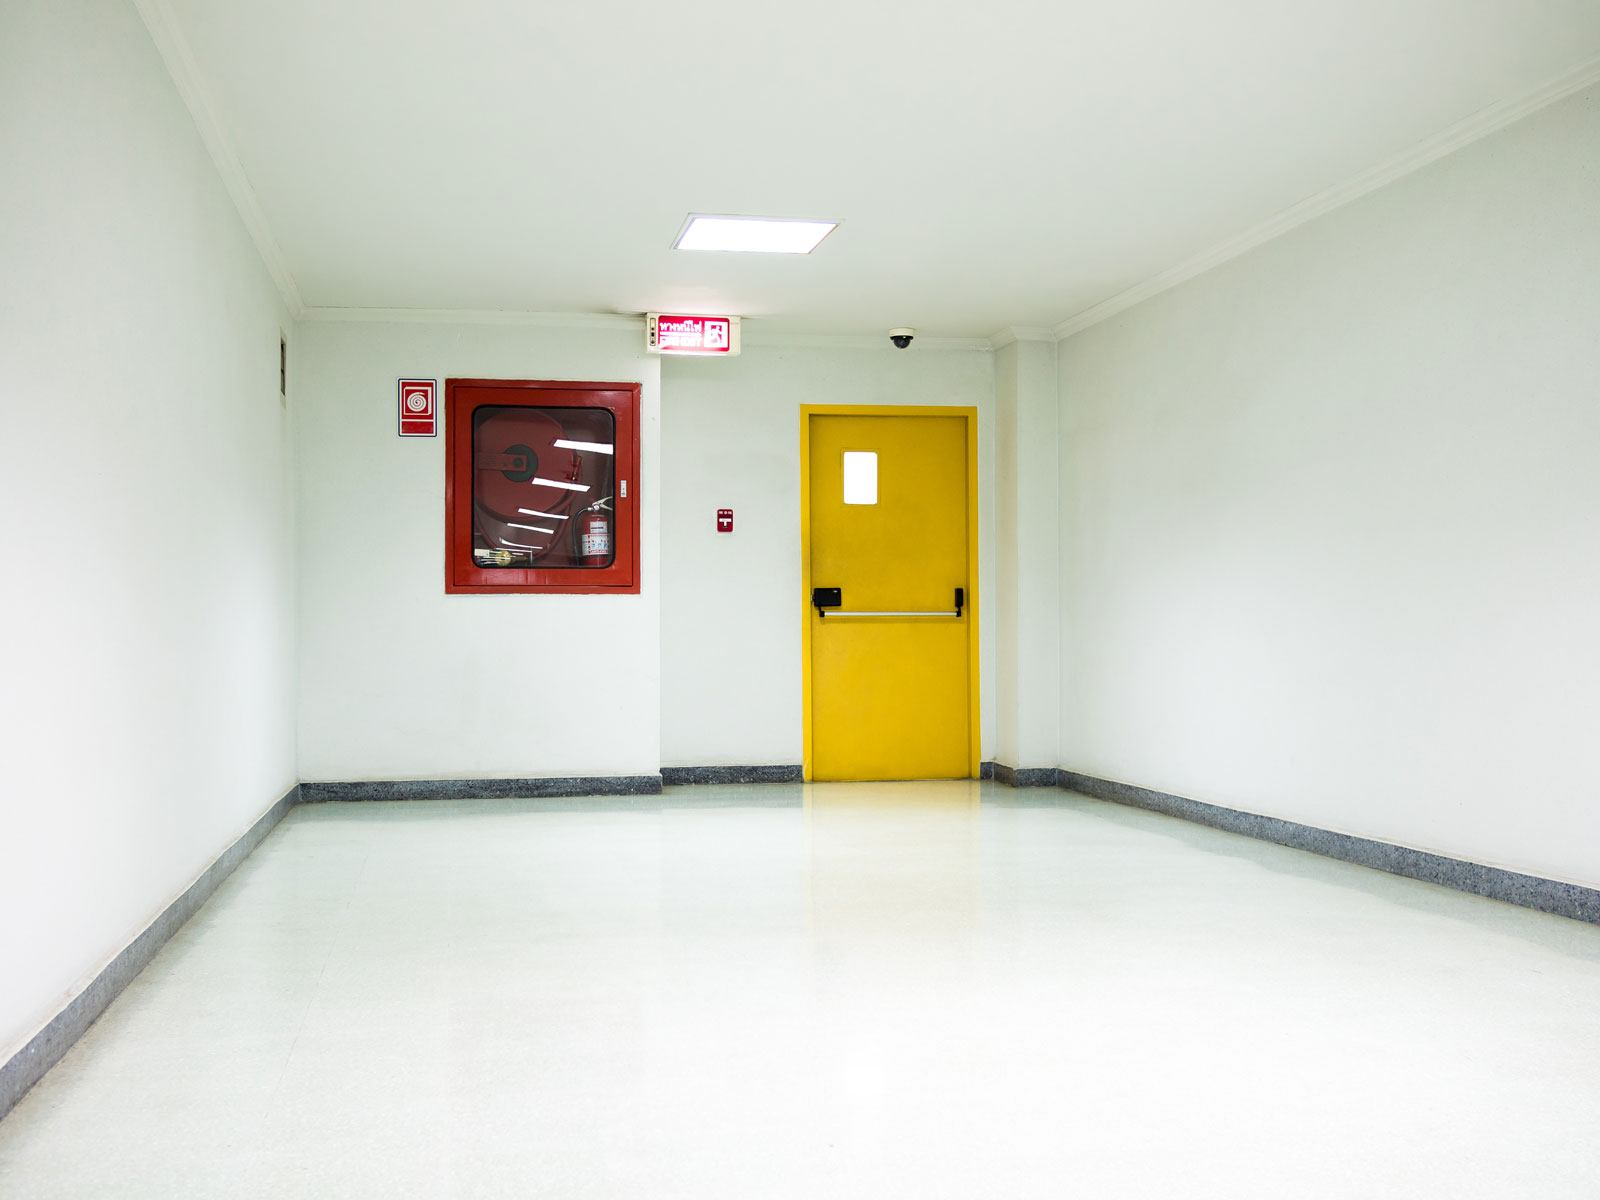 Puerta cortafuego amarilla